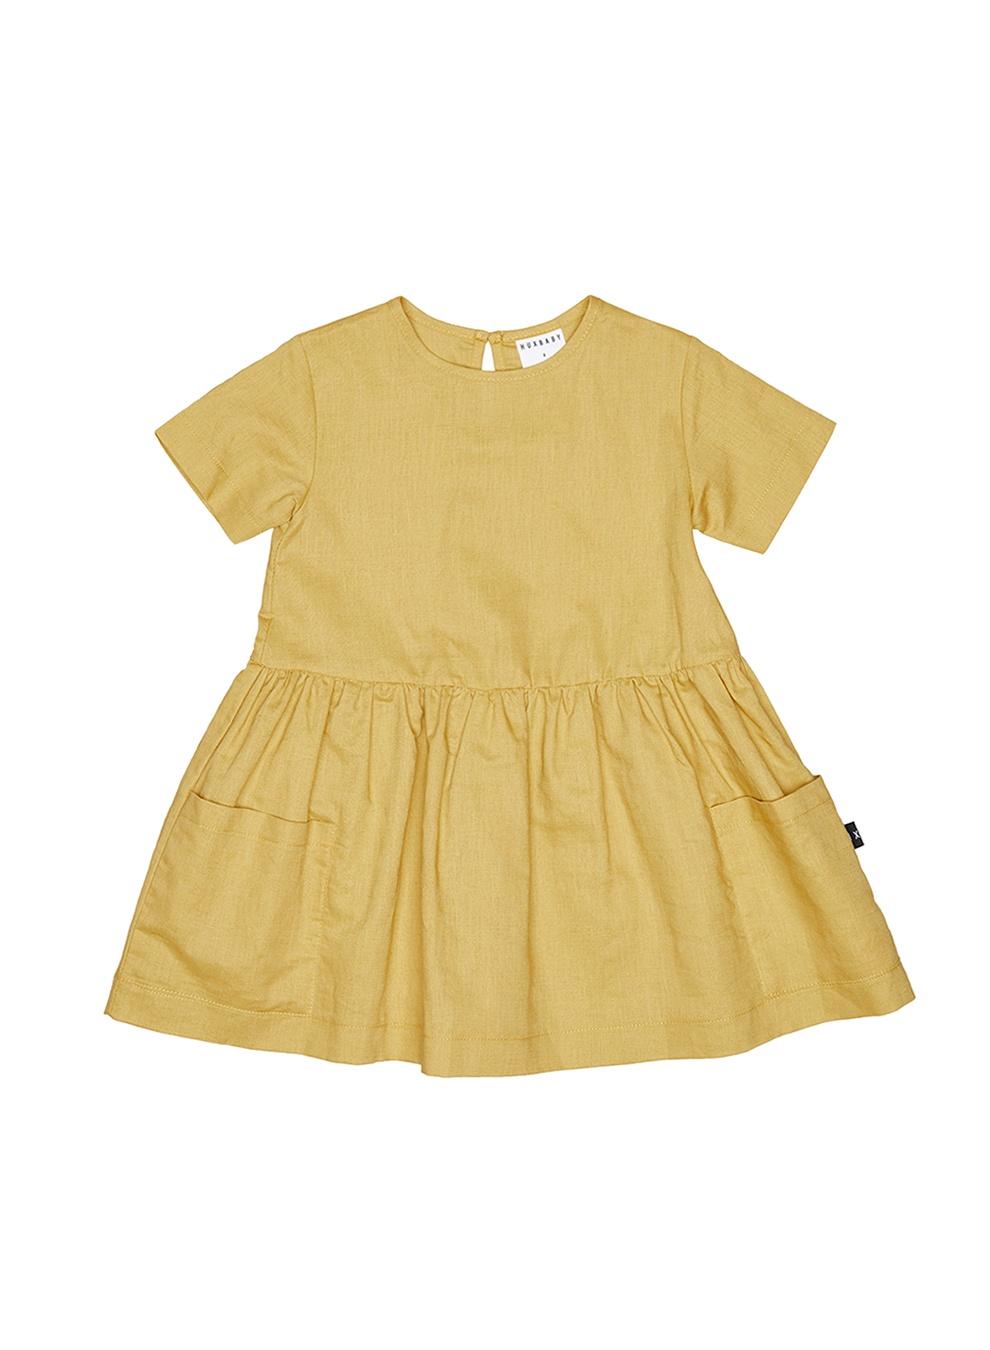 MUSTARD DARCY DRESS